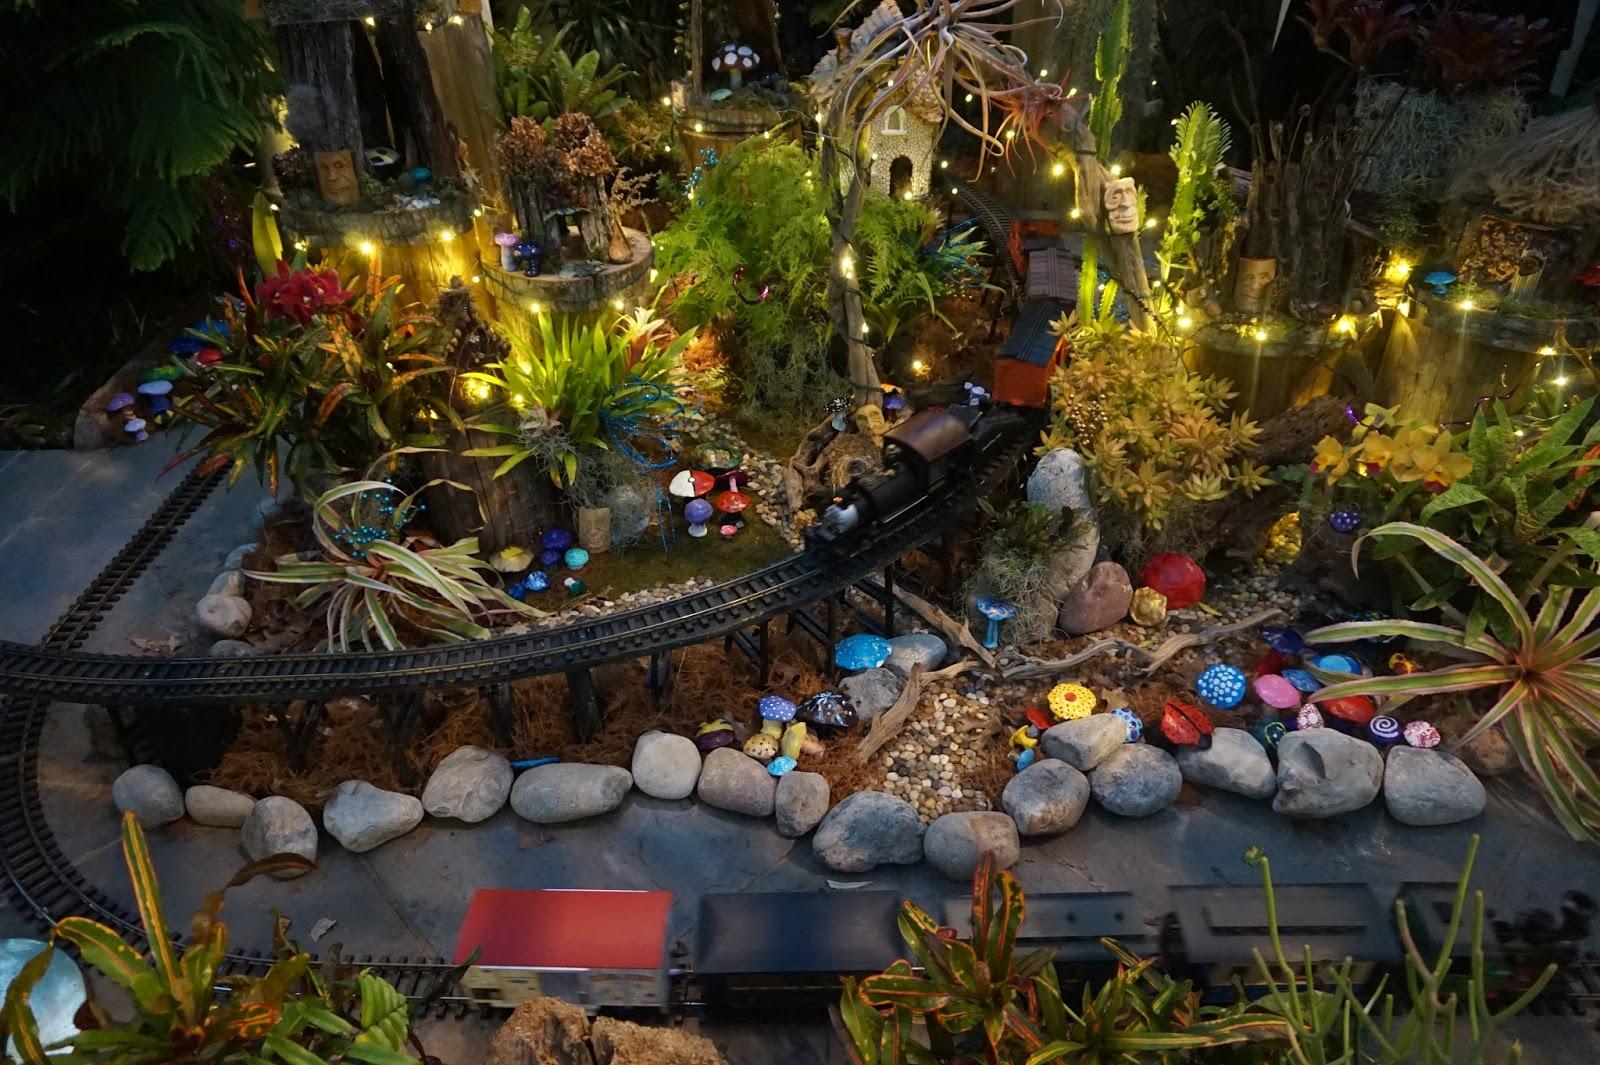 Kiki Nakita Opening Christmas Gifts And Daniel Stowe Botanical Garden